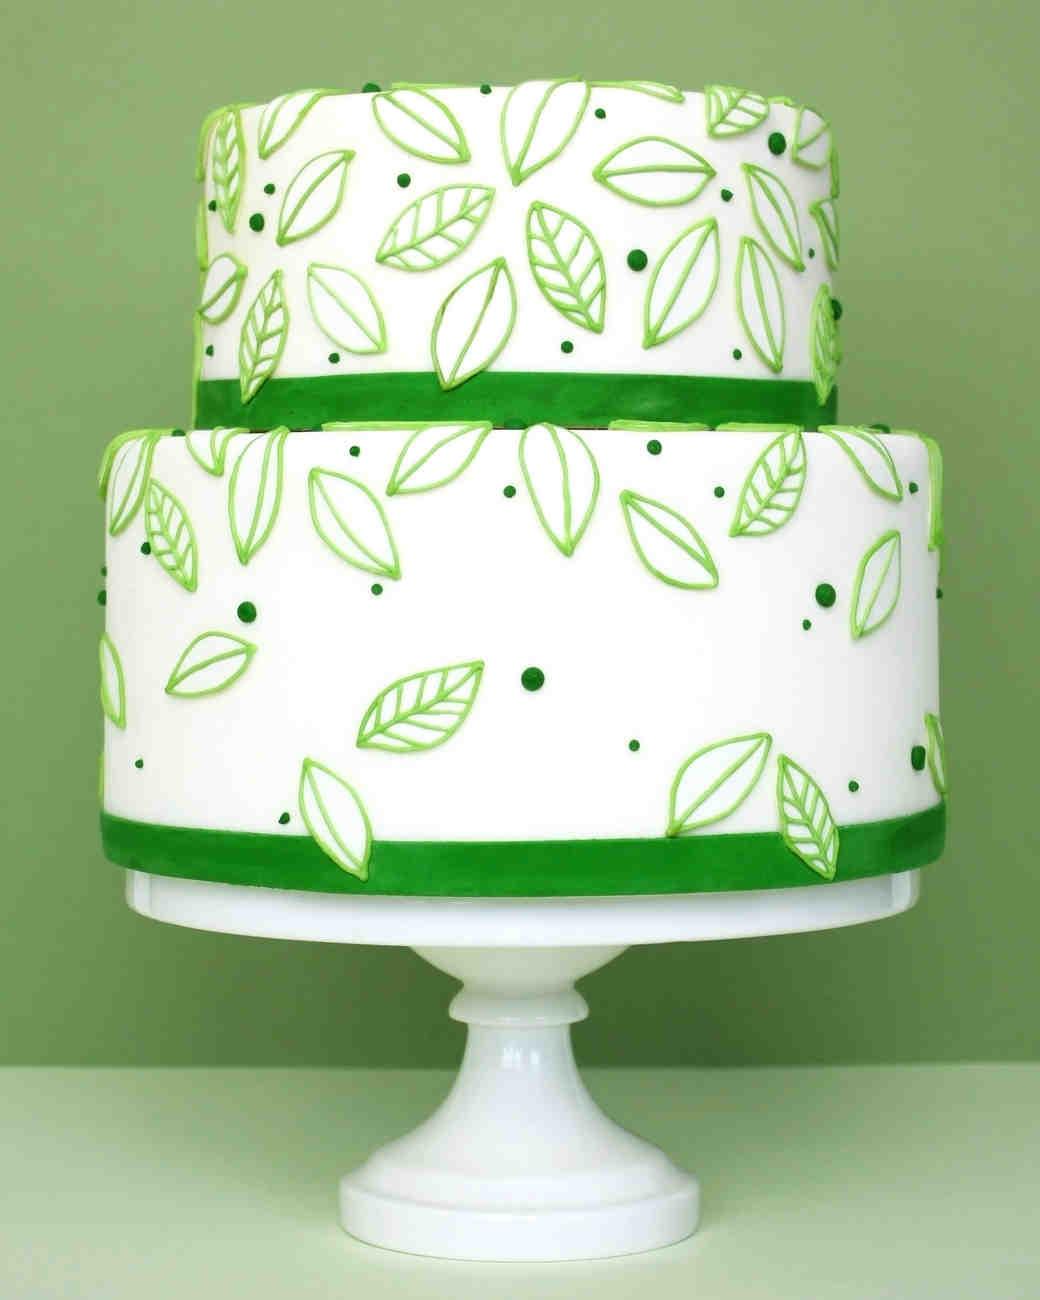 cake-pros-eatcakebemerry-0414.jpg